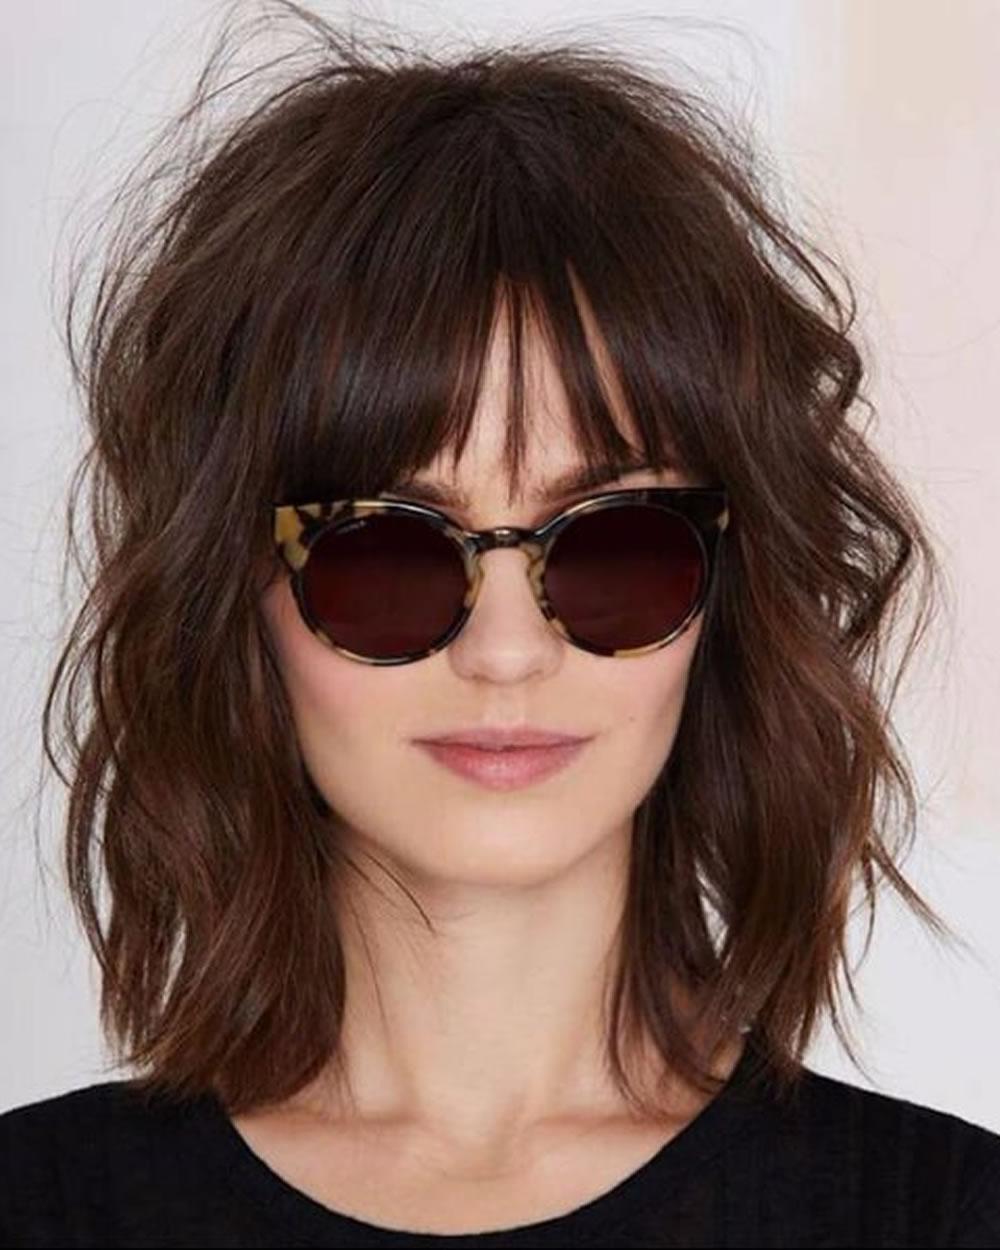 Short Shag Haircuts And Medium Shag Hairstyles – Shaggy Hair Image Within Short To Medium Shaggy Hairstyles (View 4 of 25)